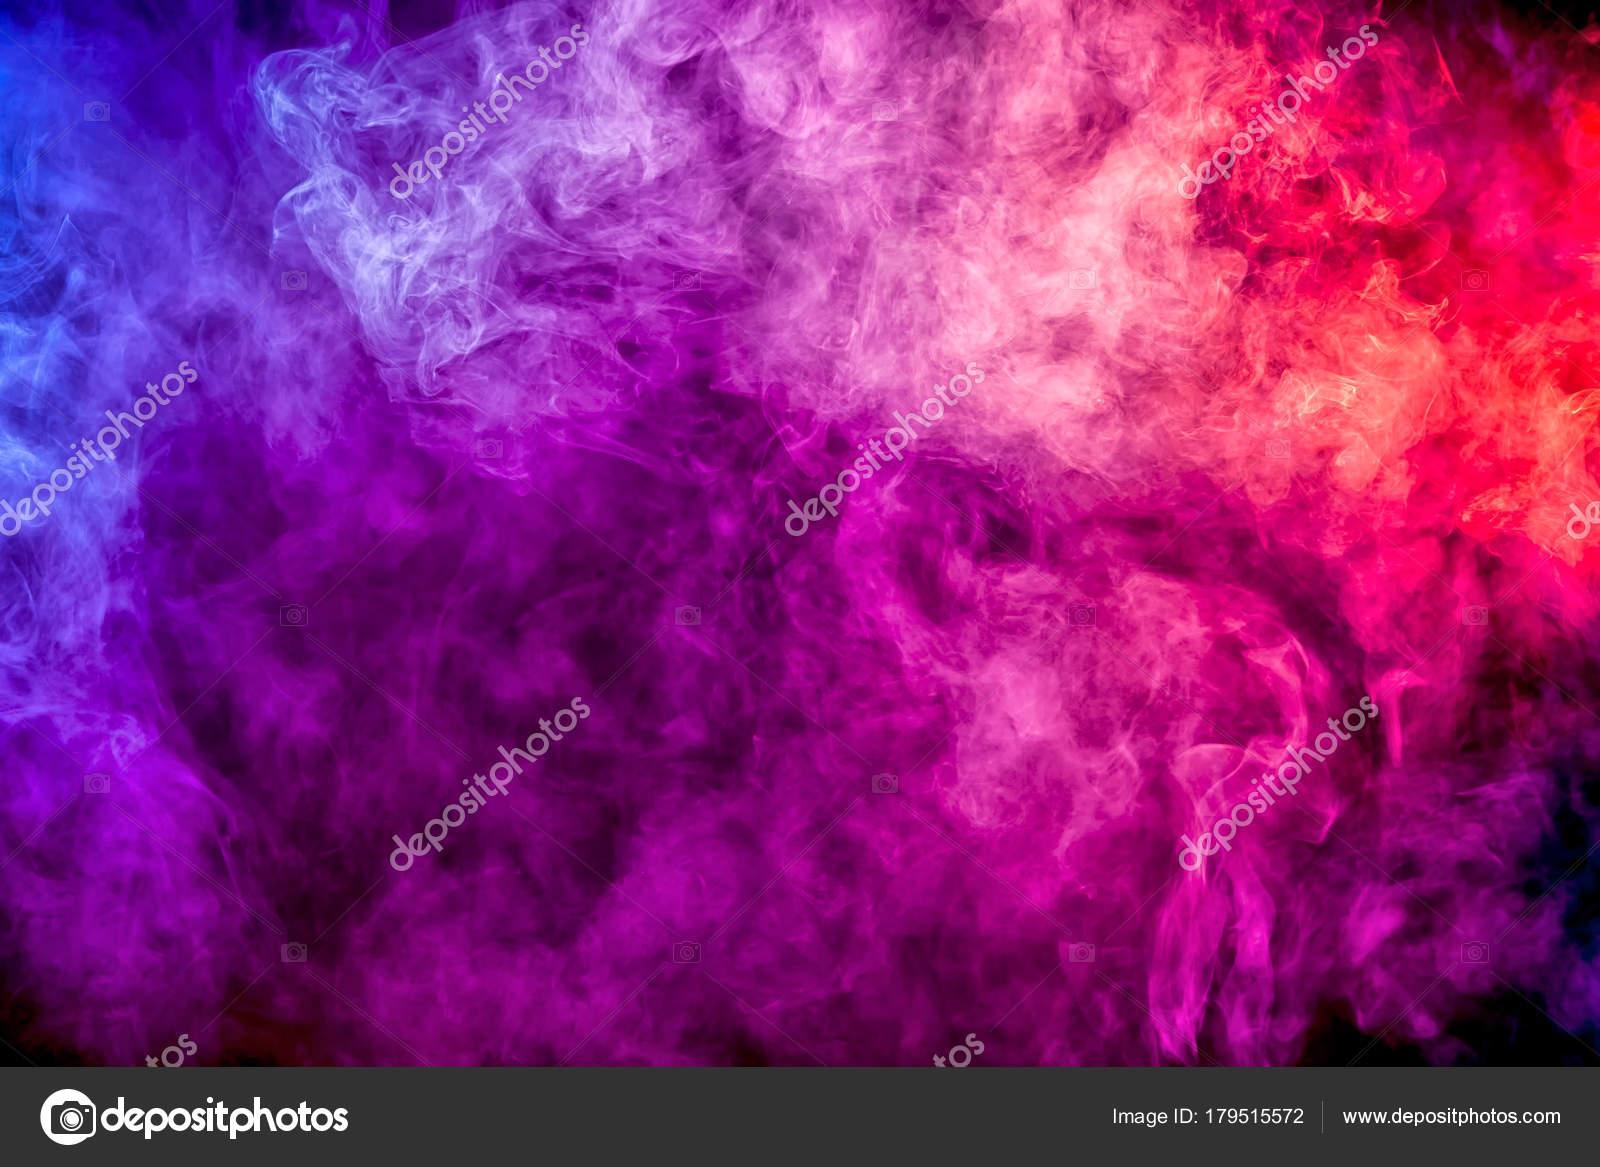 Humo Colores Morado Rosa Rojo Sobre Fondo Negro Aislado